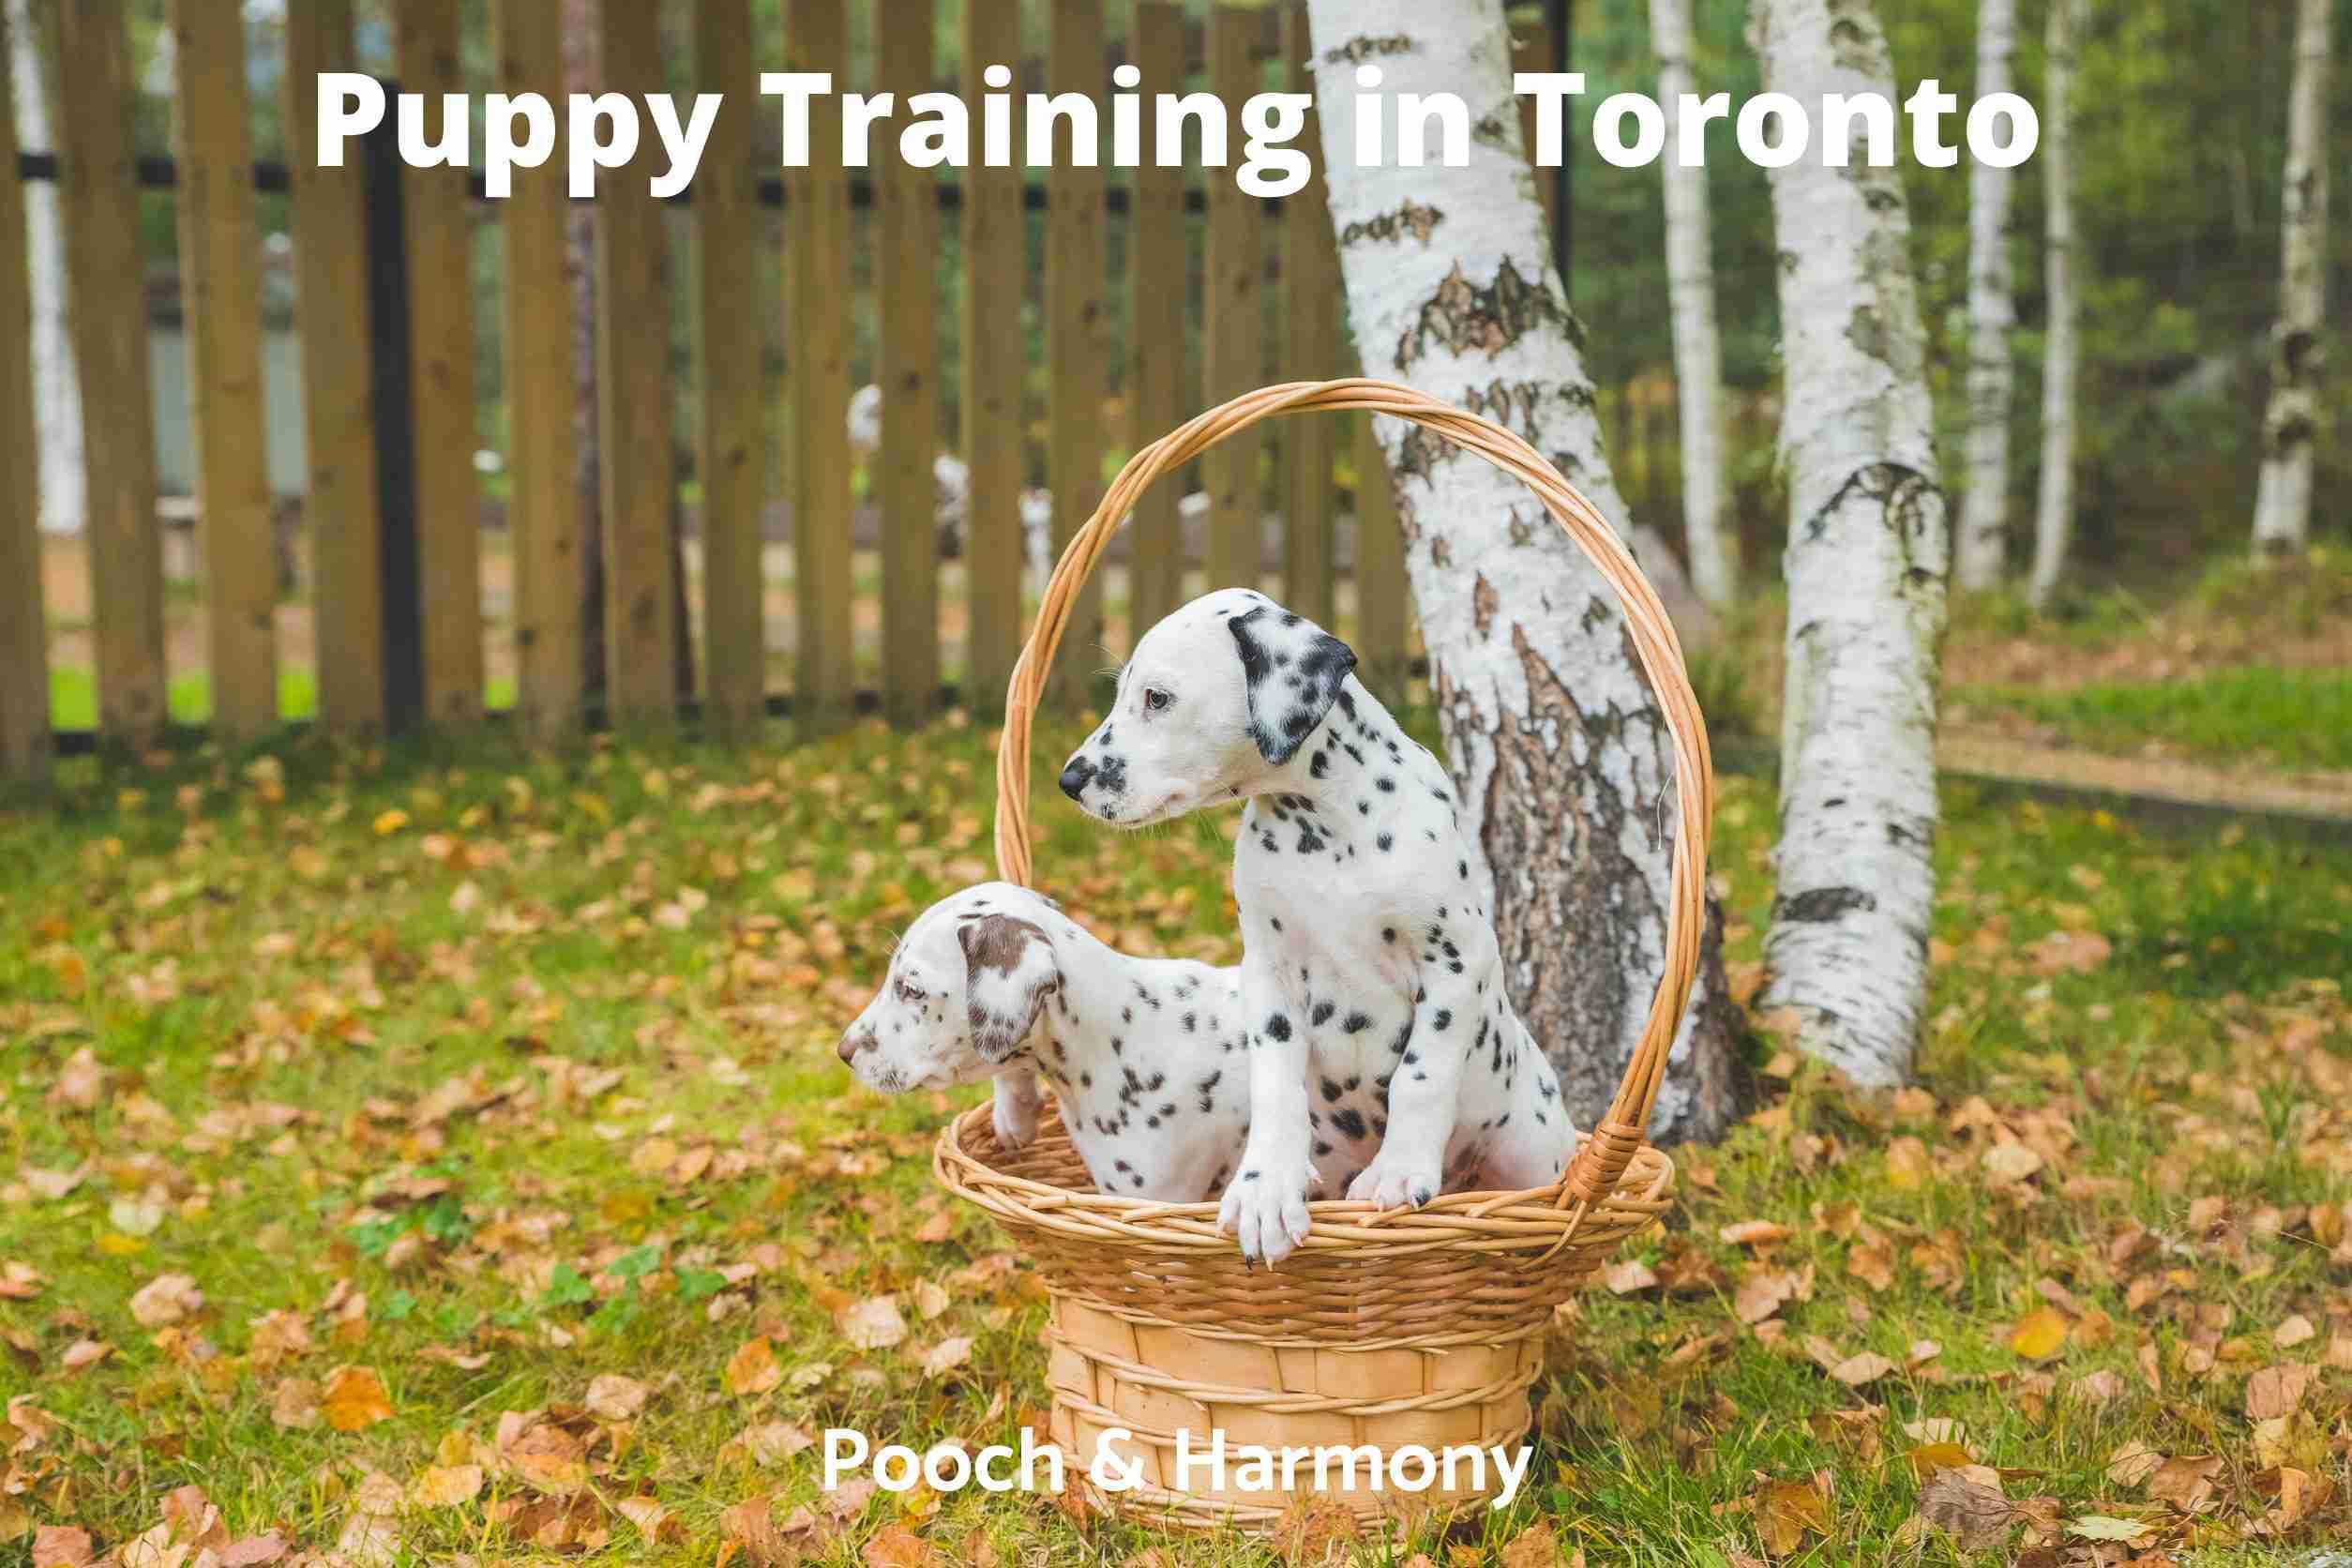 Puppy Training in Toronto